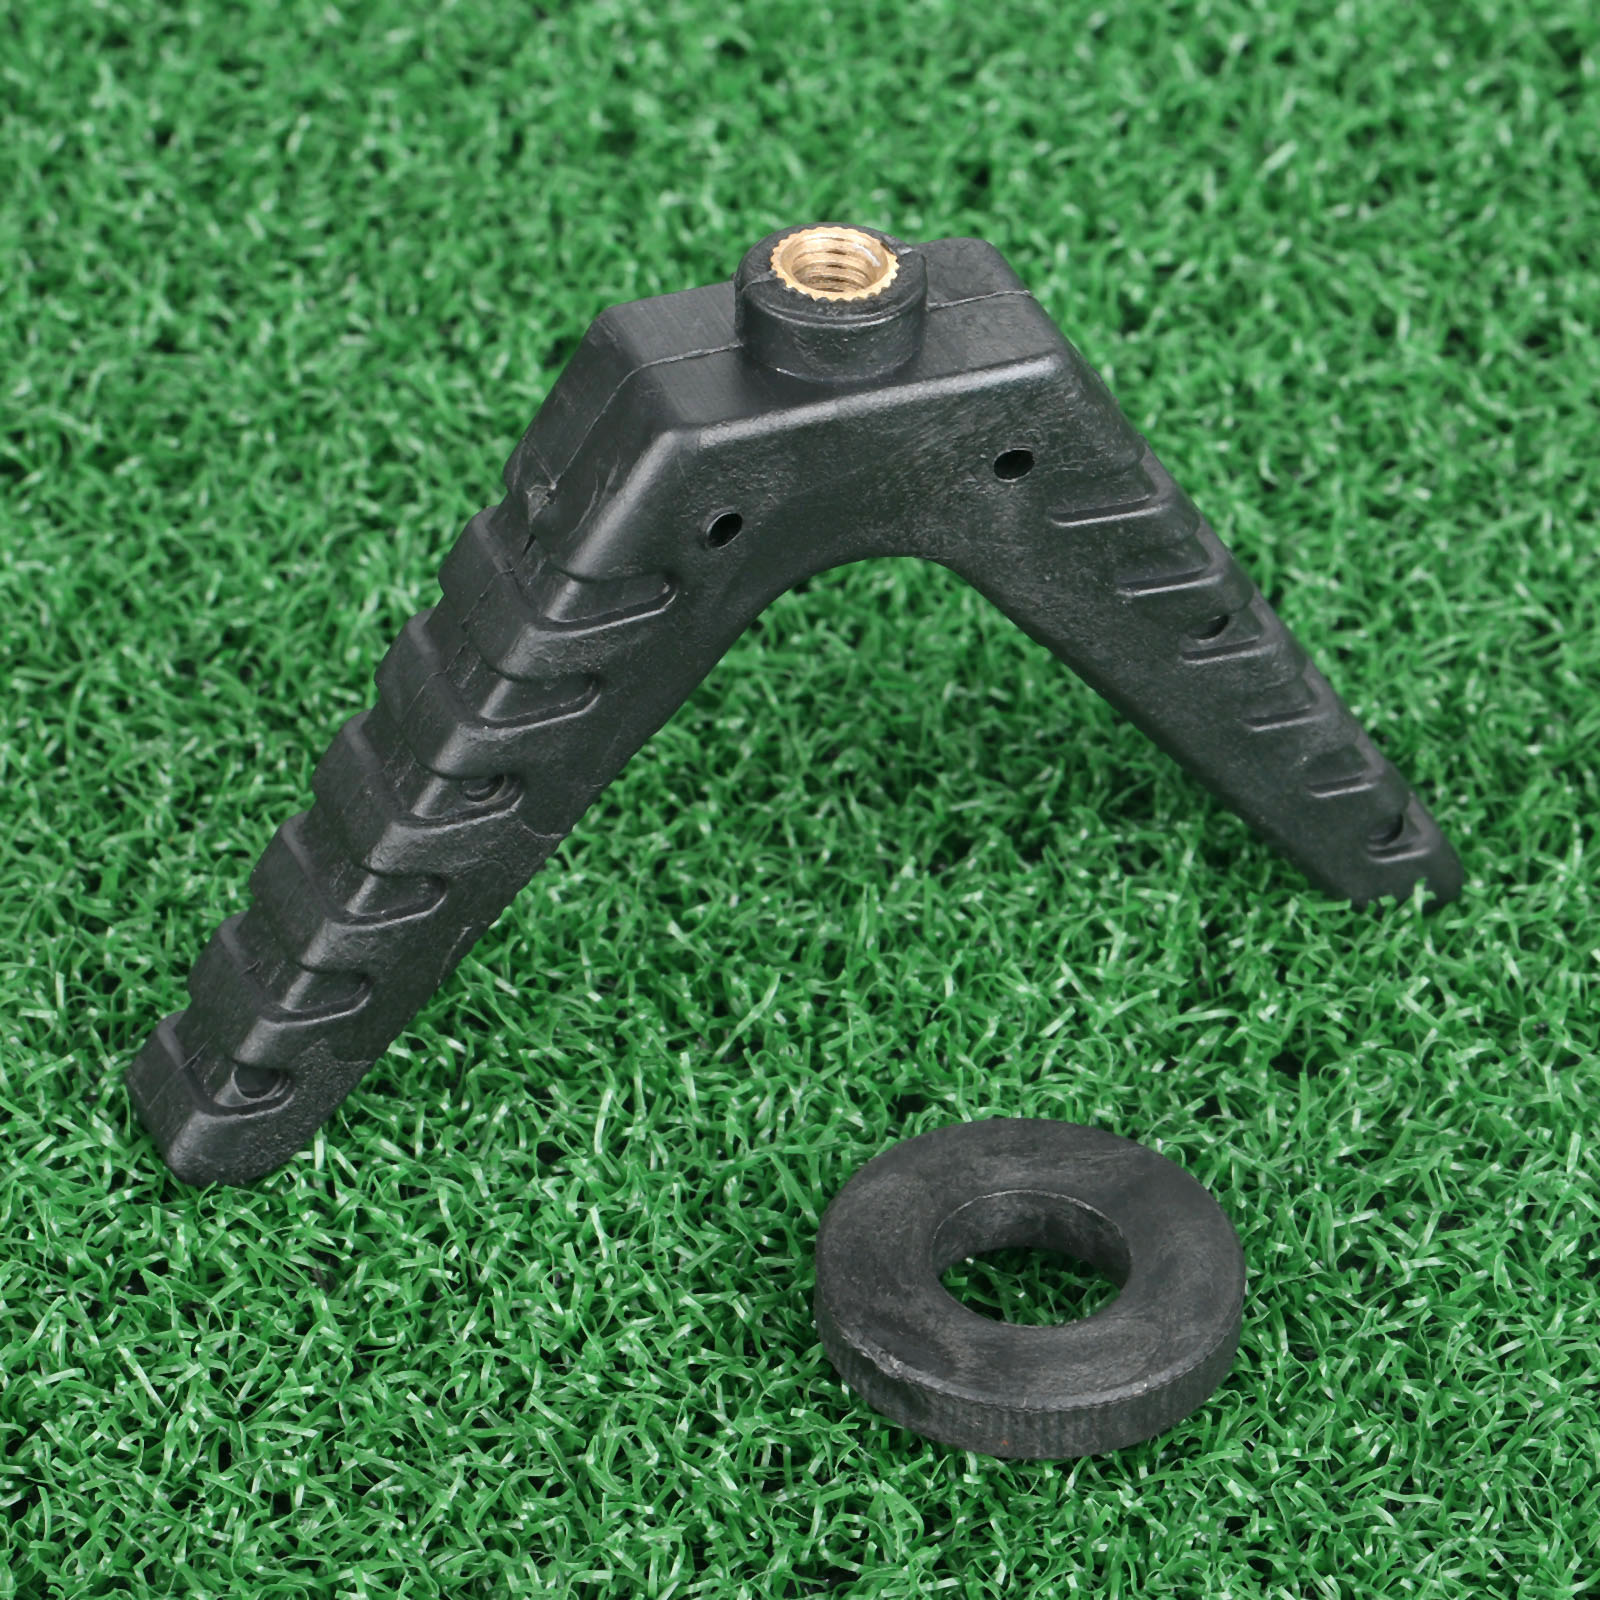 Plastic Universal Hunting Gun Rest Stick Shooting Accessories Fit For Rack V-Yoke V Camera Tripod With Bottom M6x1.0 Threads